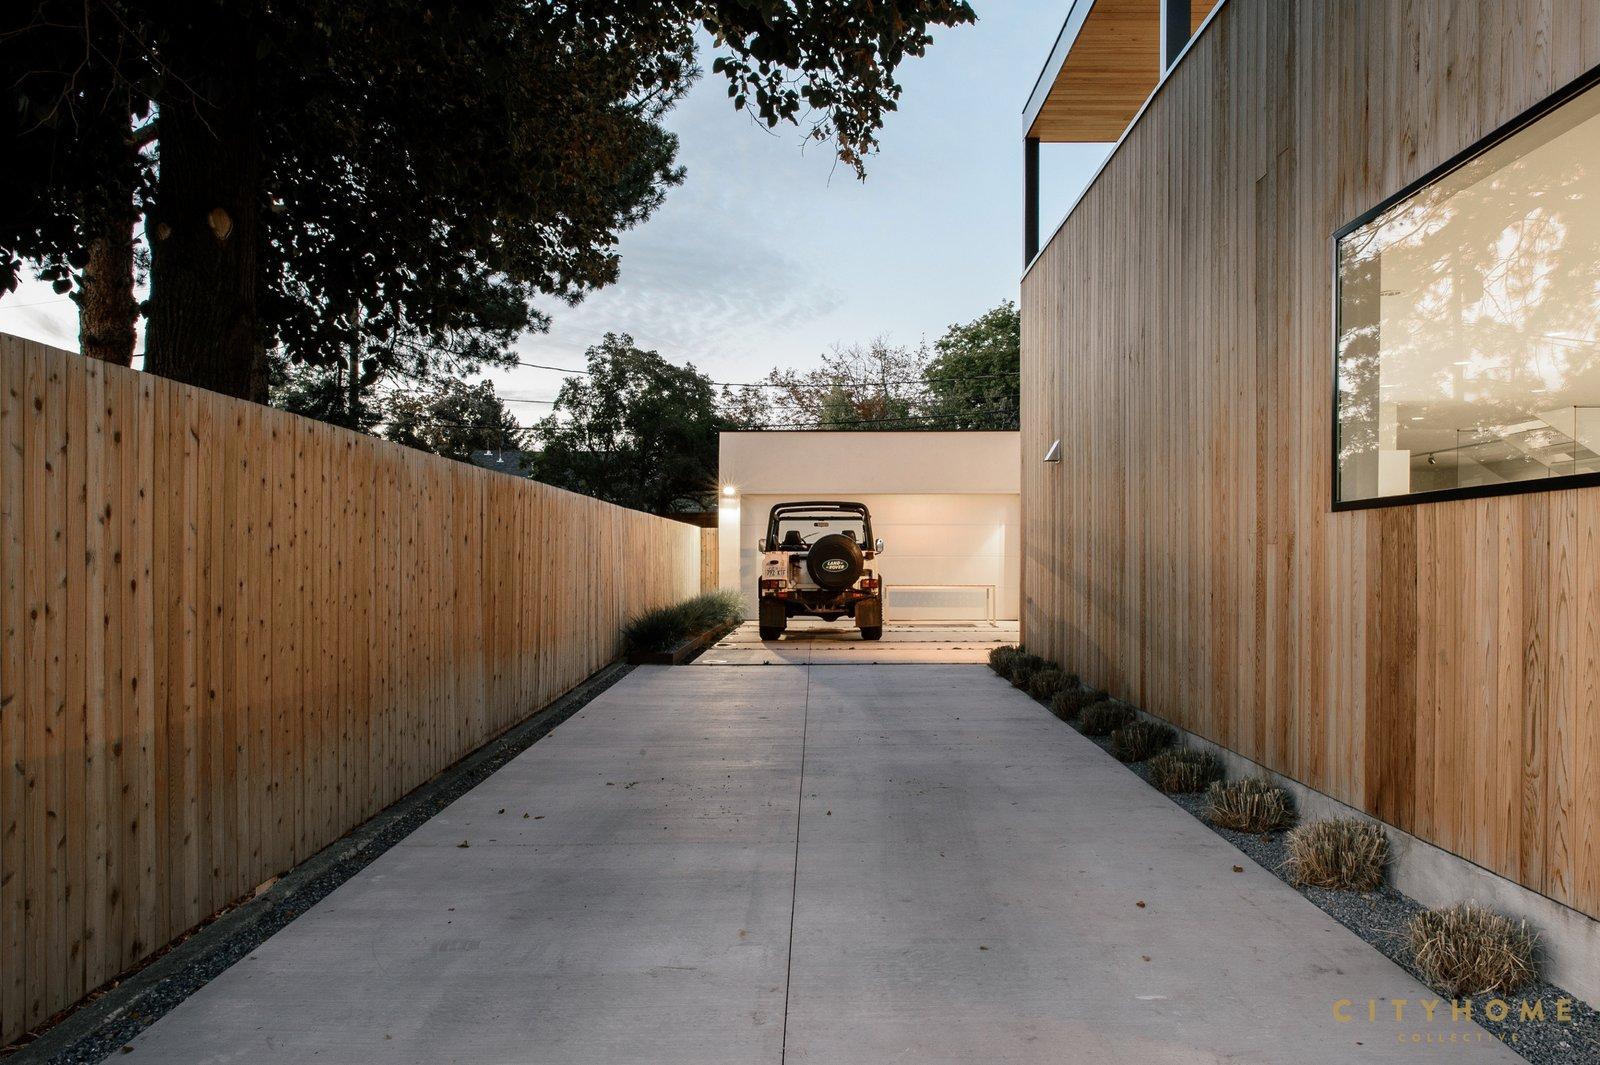 2 car garage Tagged: Garage and Detached Garage.  Sugarhouse Studio by Brent  Jespersen